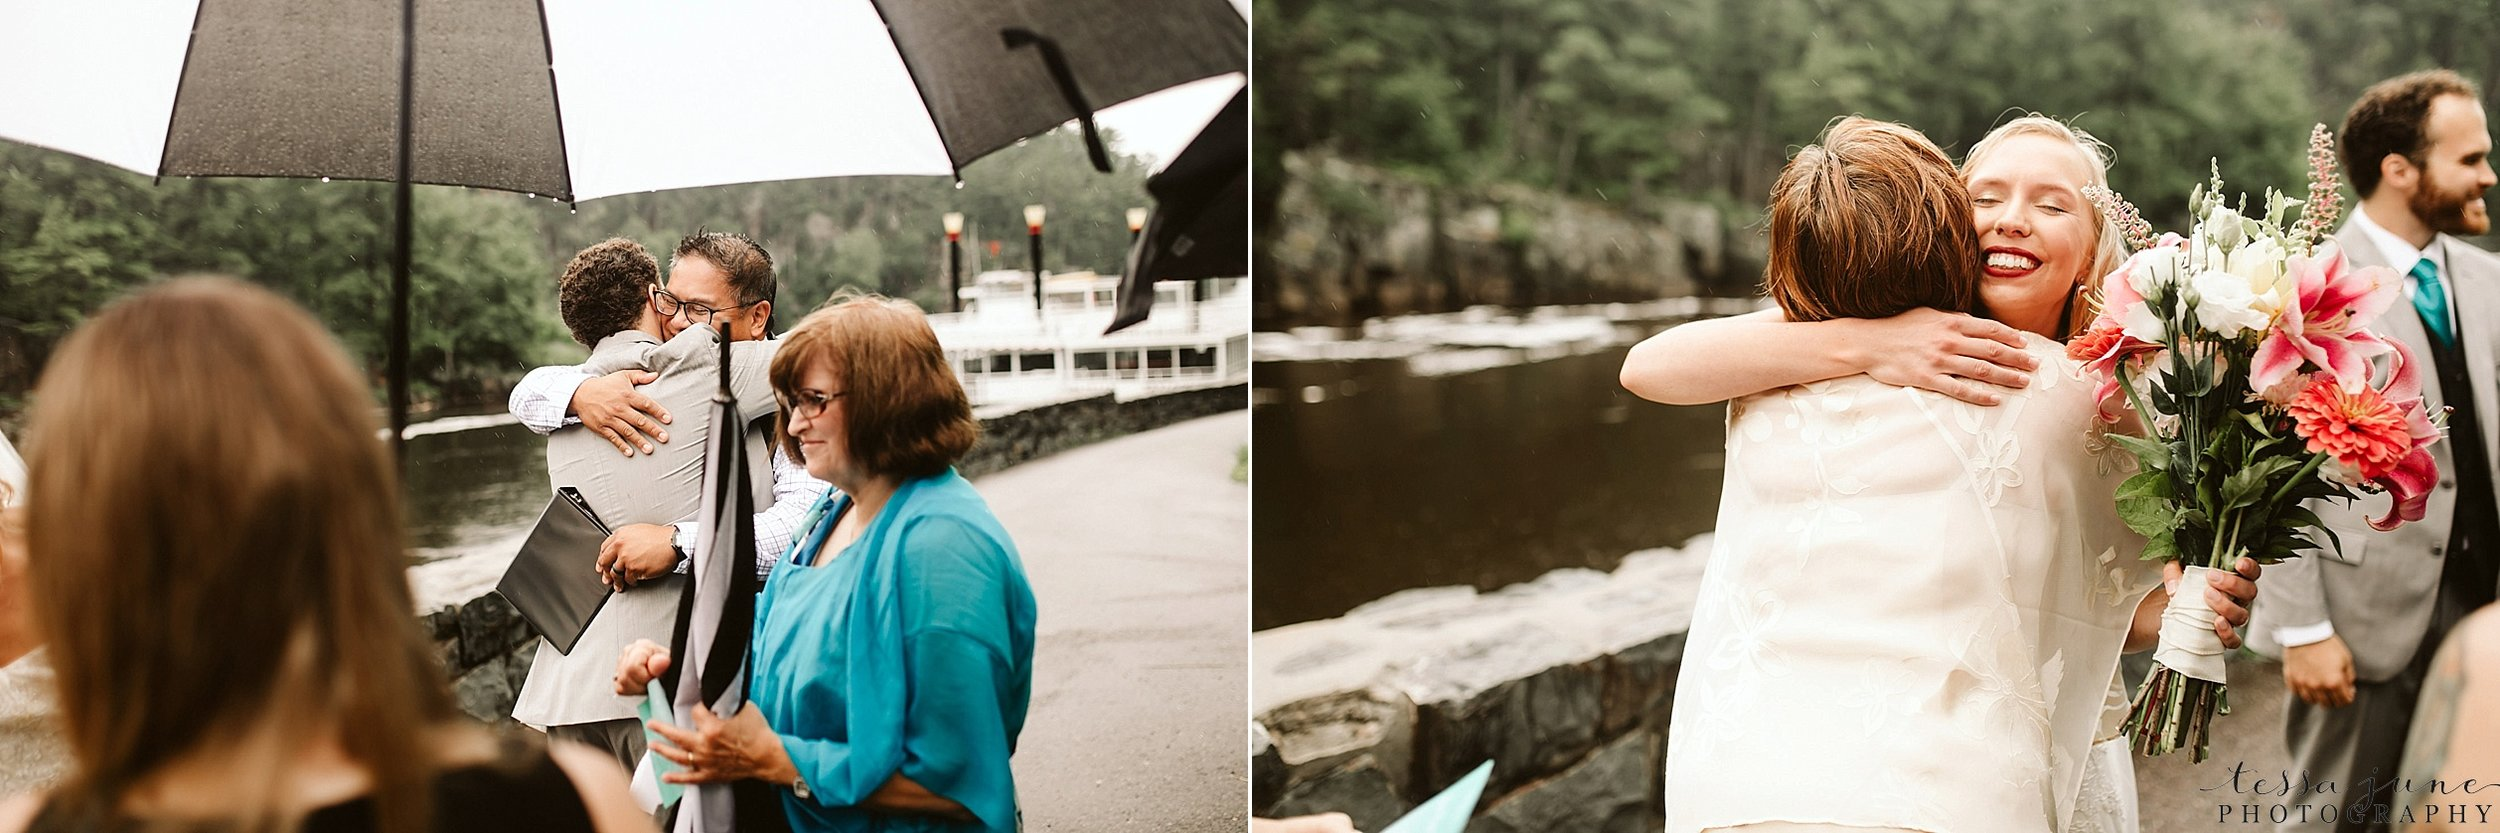 taylors-falls-rainy-elopement-wedding-interstate-state-park-72.jpg